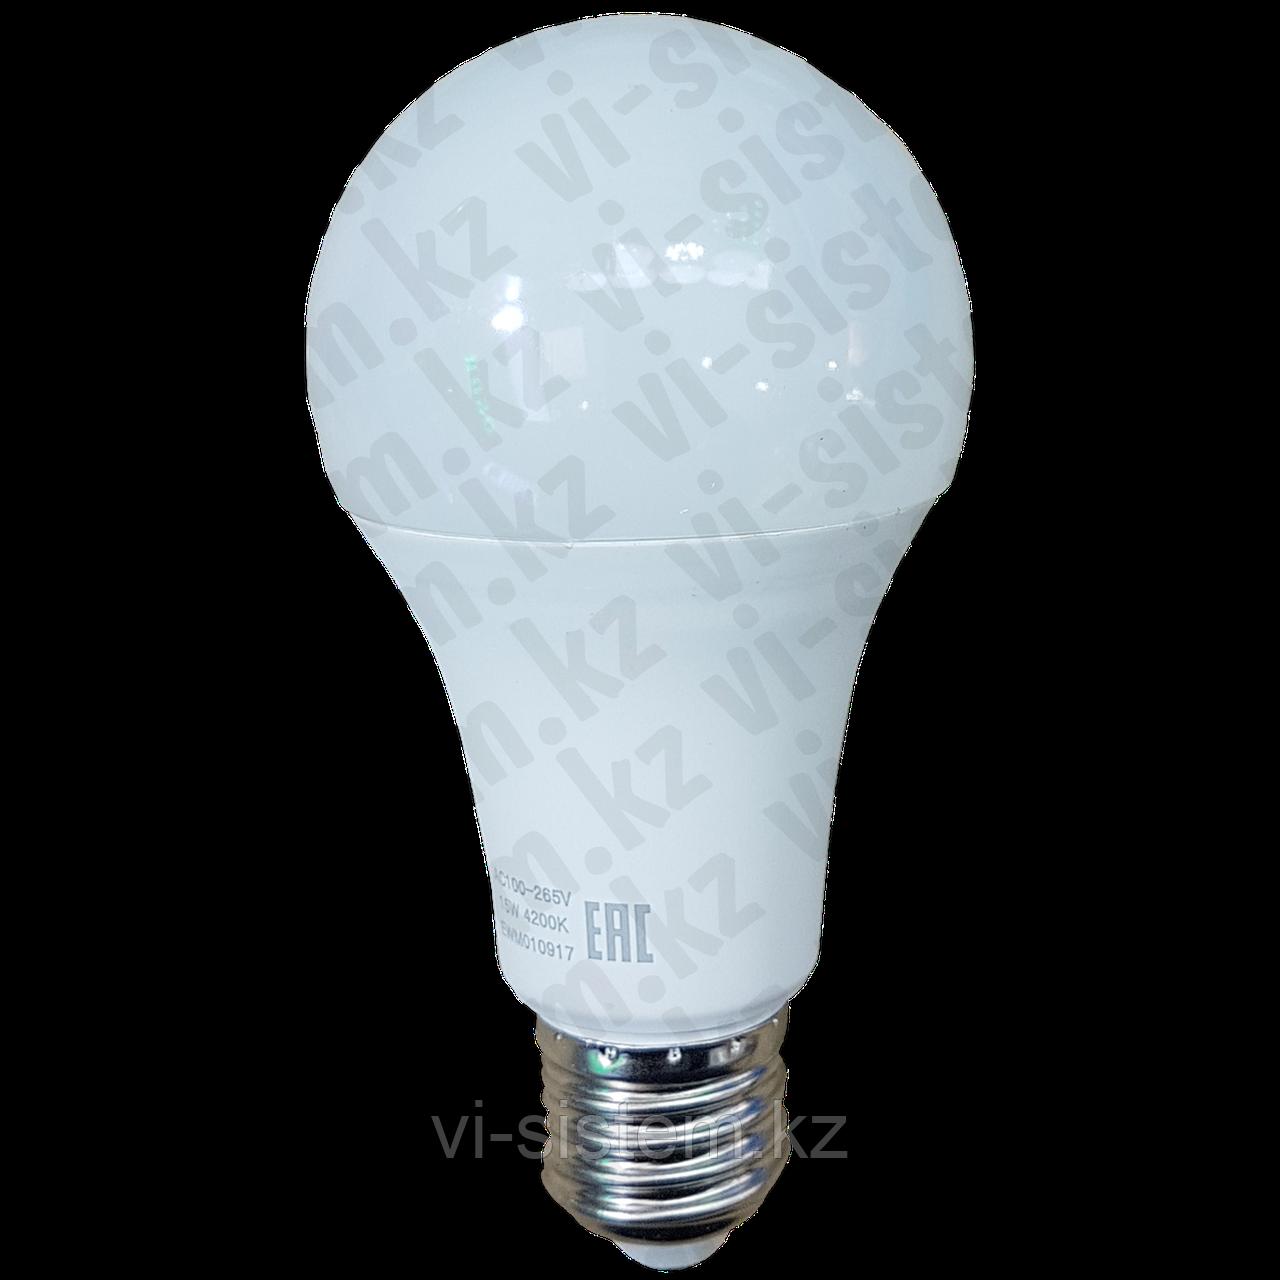 Лампа светодиодная Ergolux 12W E27 6500K